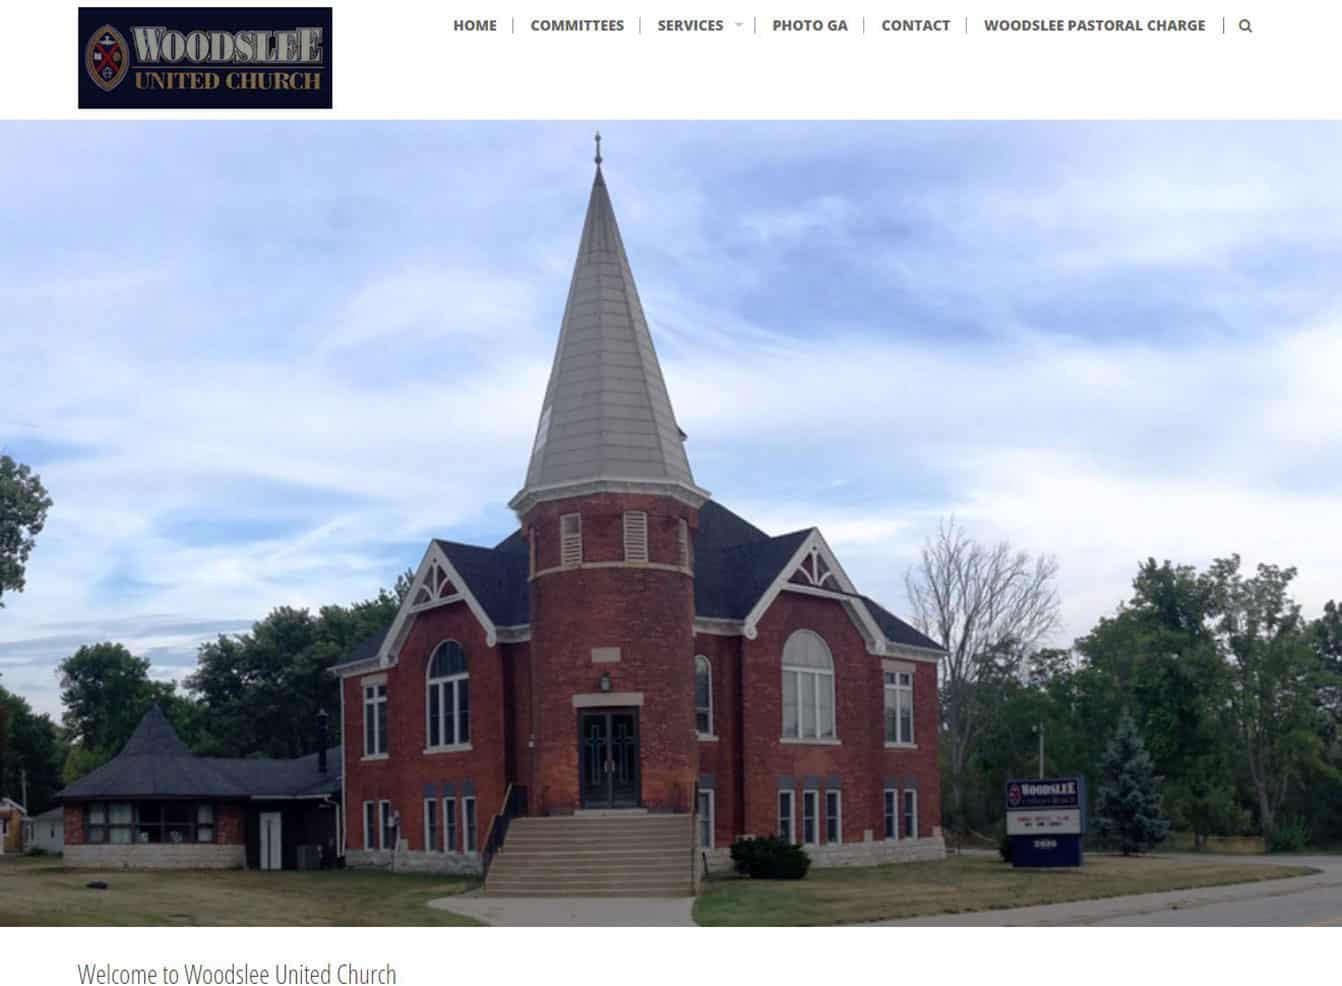 Woodslee United Church